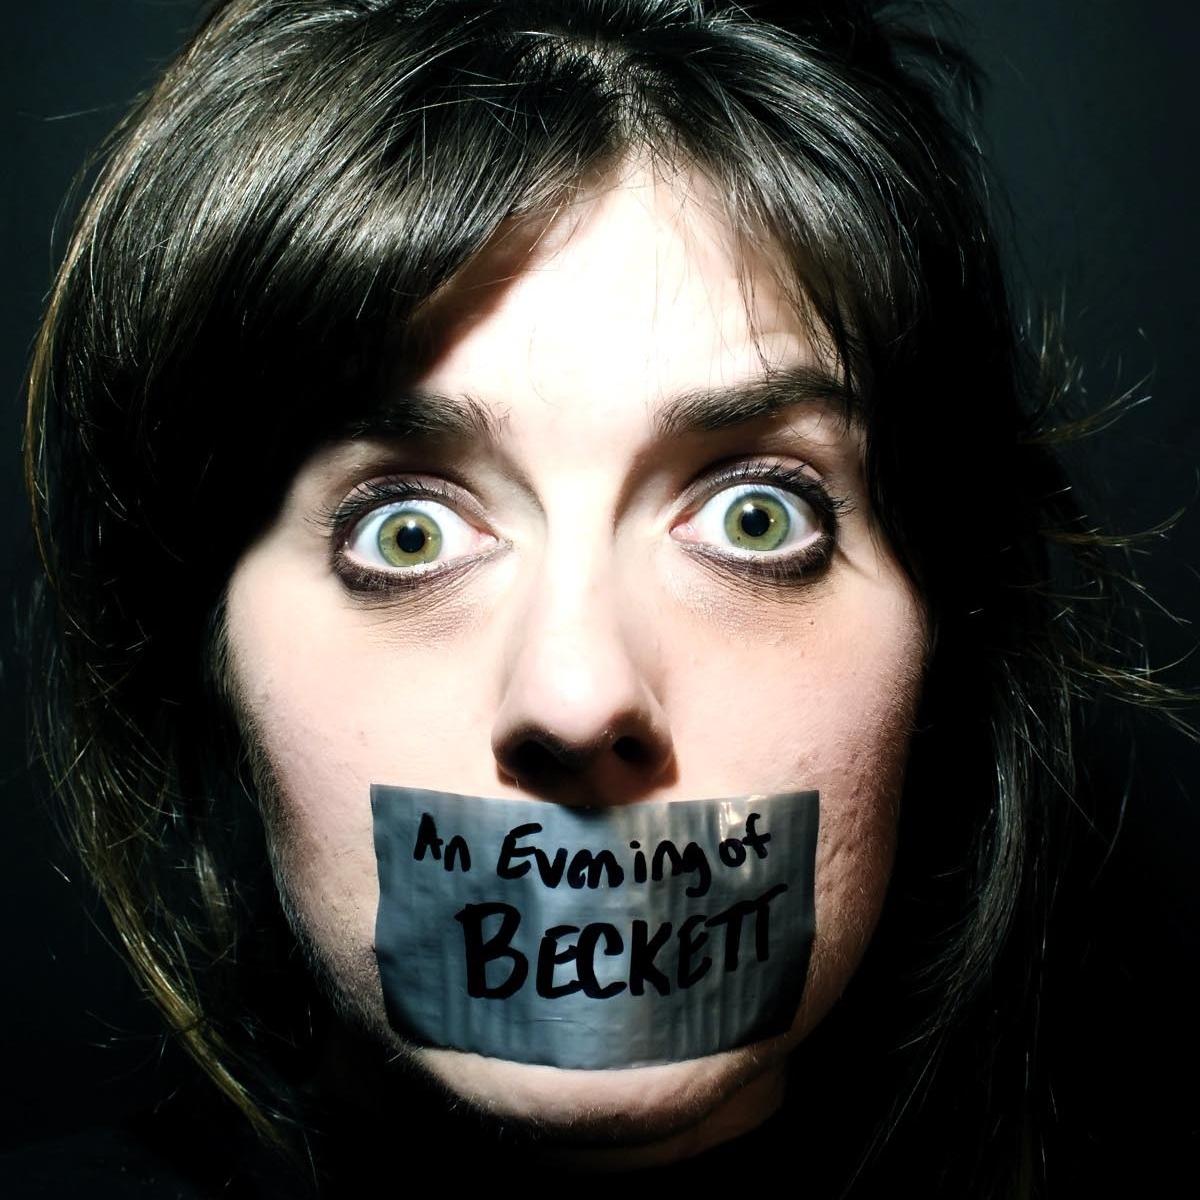 An Evening of Beckett Promotional Photos  photos by: Nick Gang